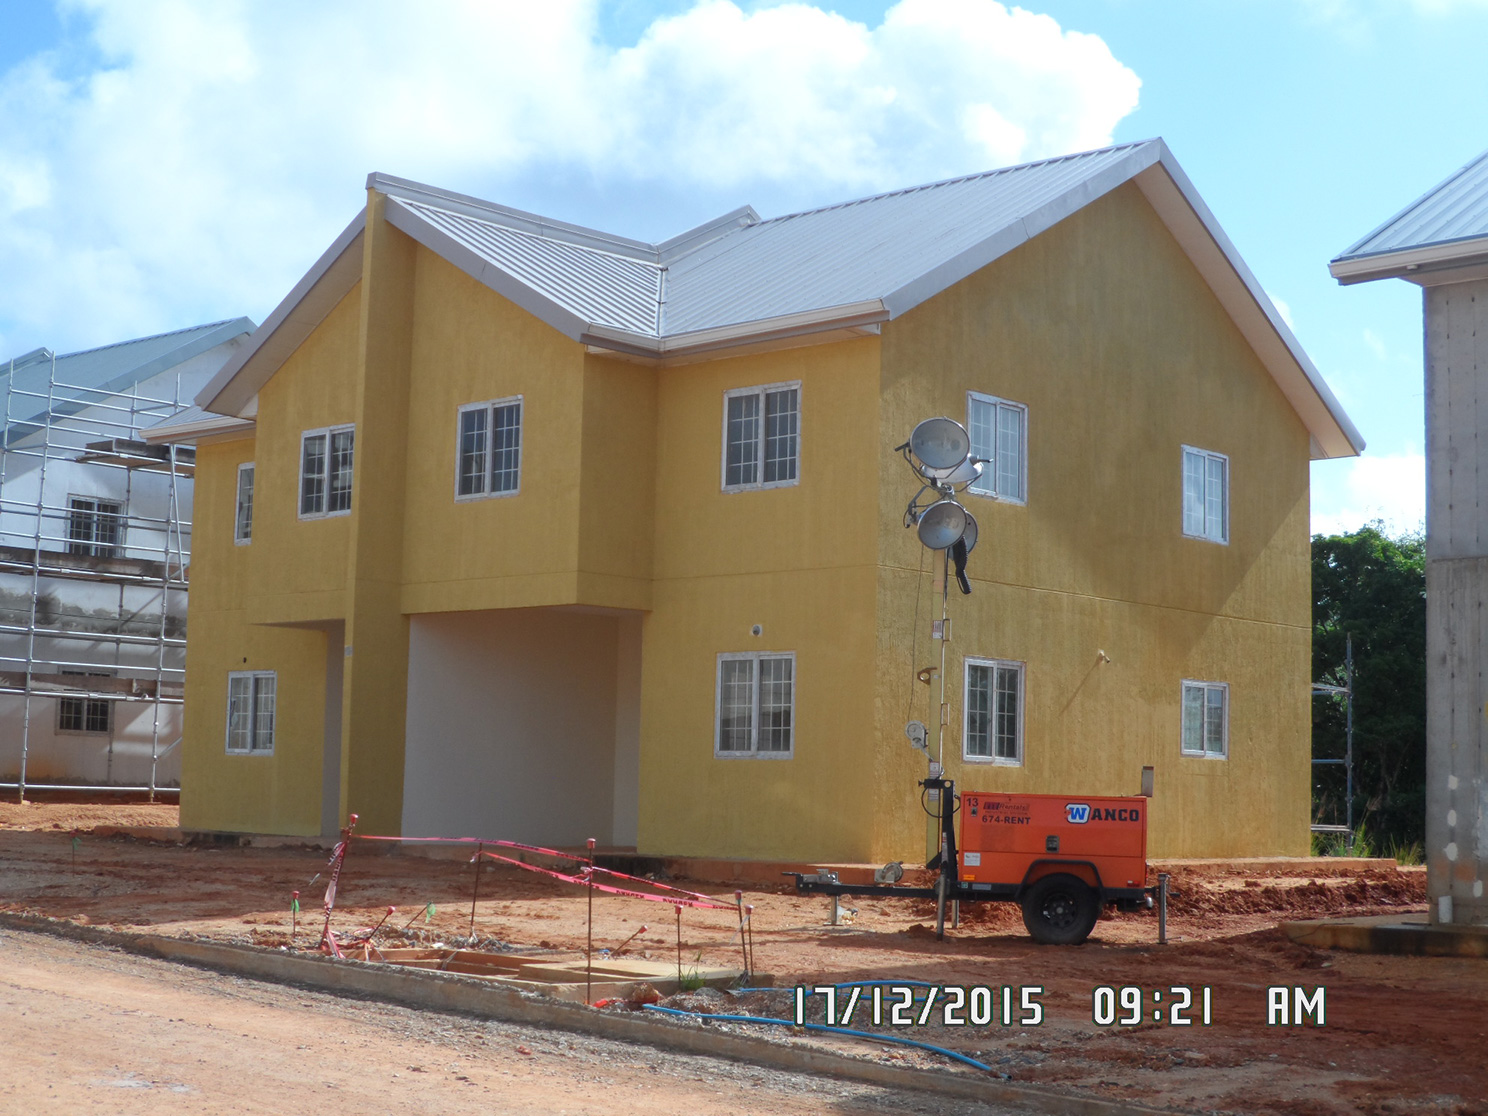 Housing Development Corporation Trinidad - 0425